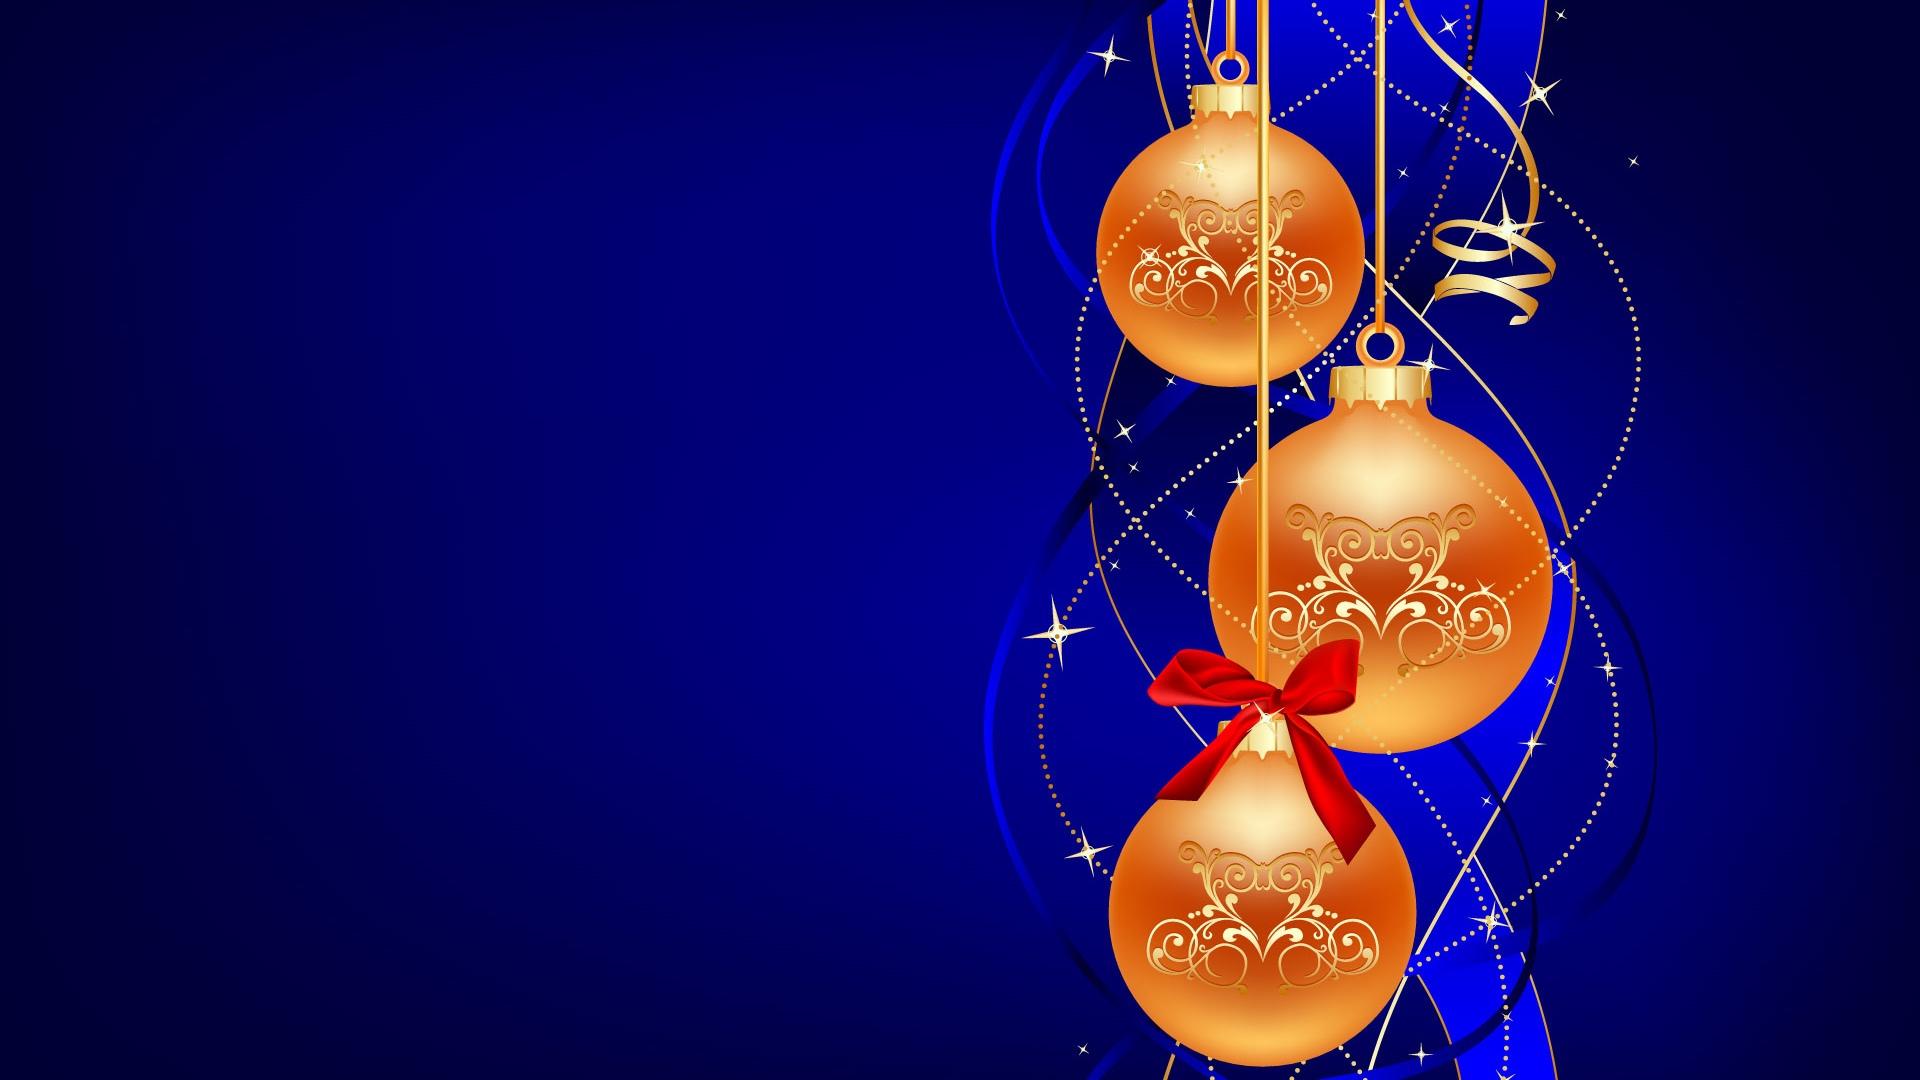 Orange ornaments blue background christmas